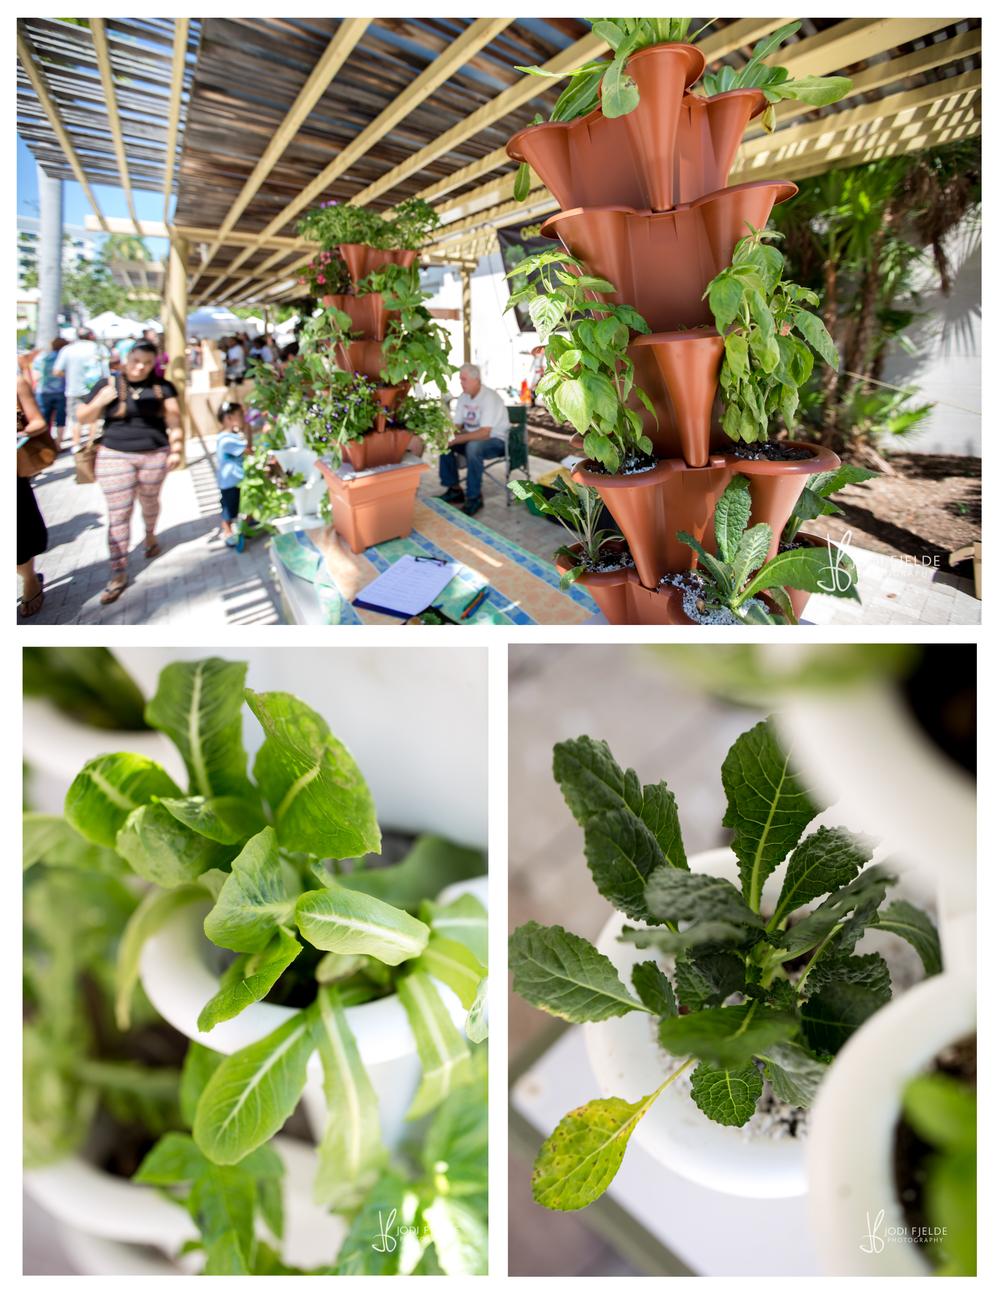 West_Palm_Beach_Green_Market_Organic_jodi_fjelde_Photography_10.jpg